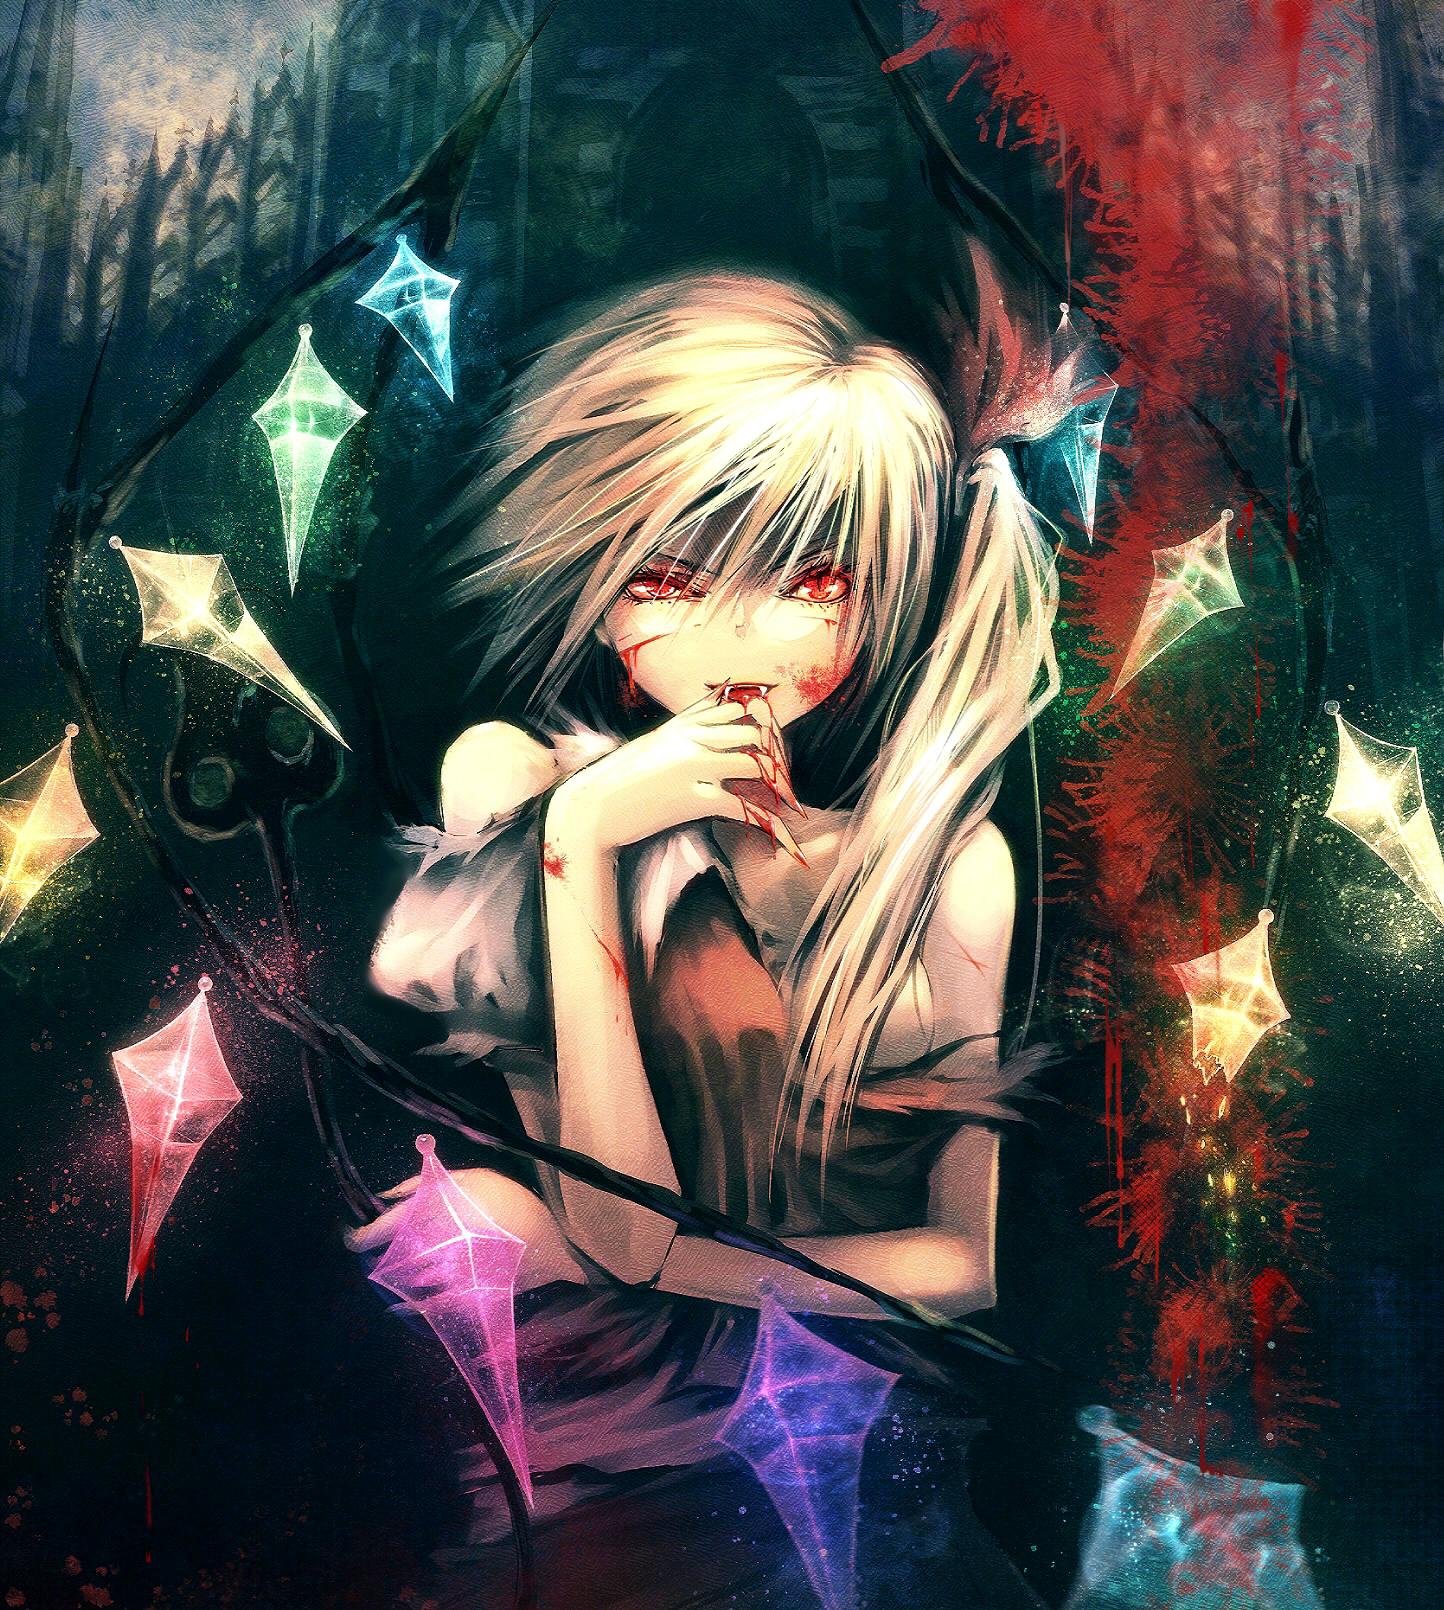 kerberoz anime nsfw face show image thread xxxv random